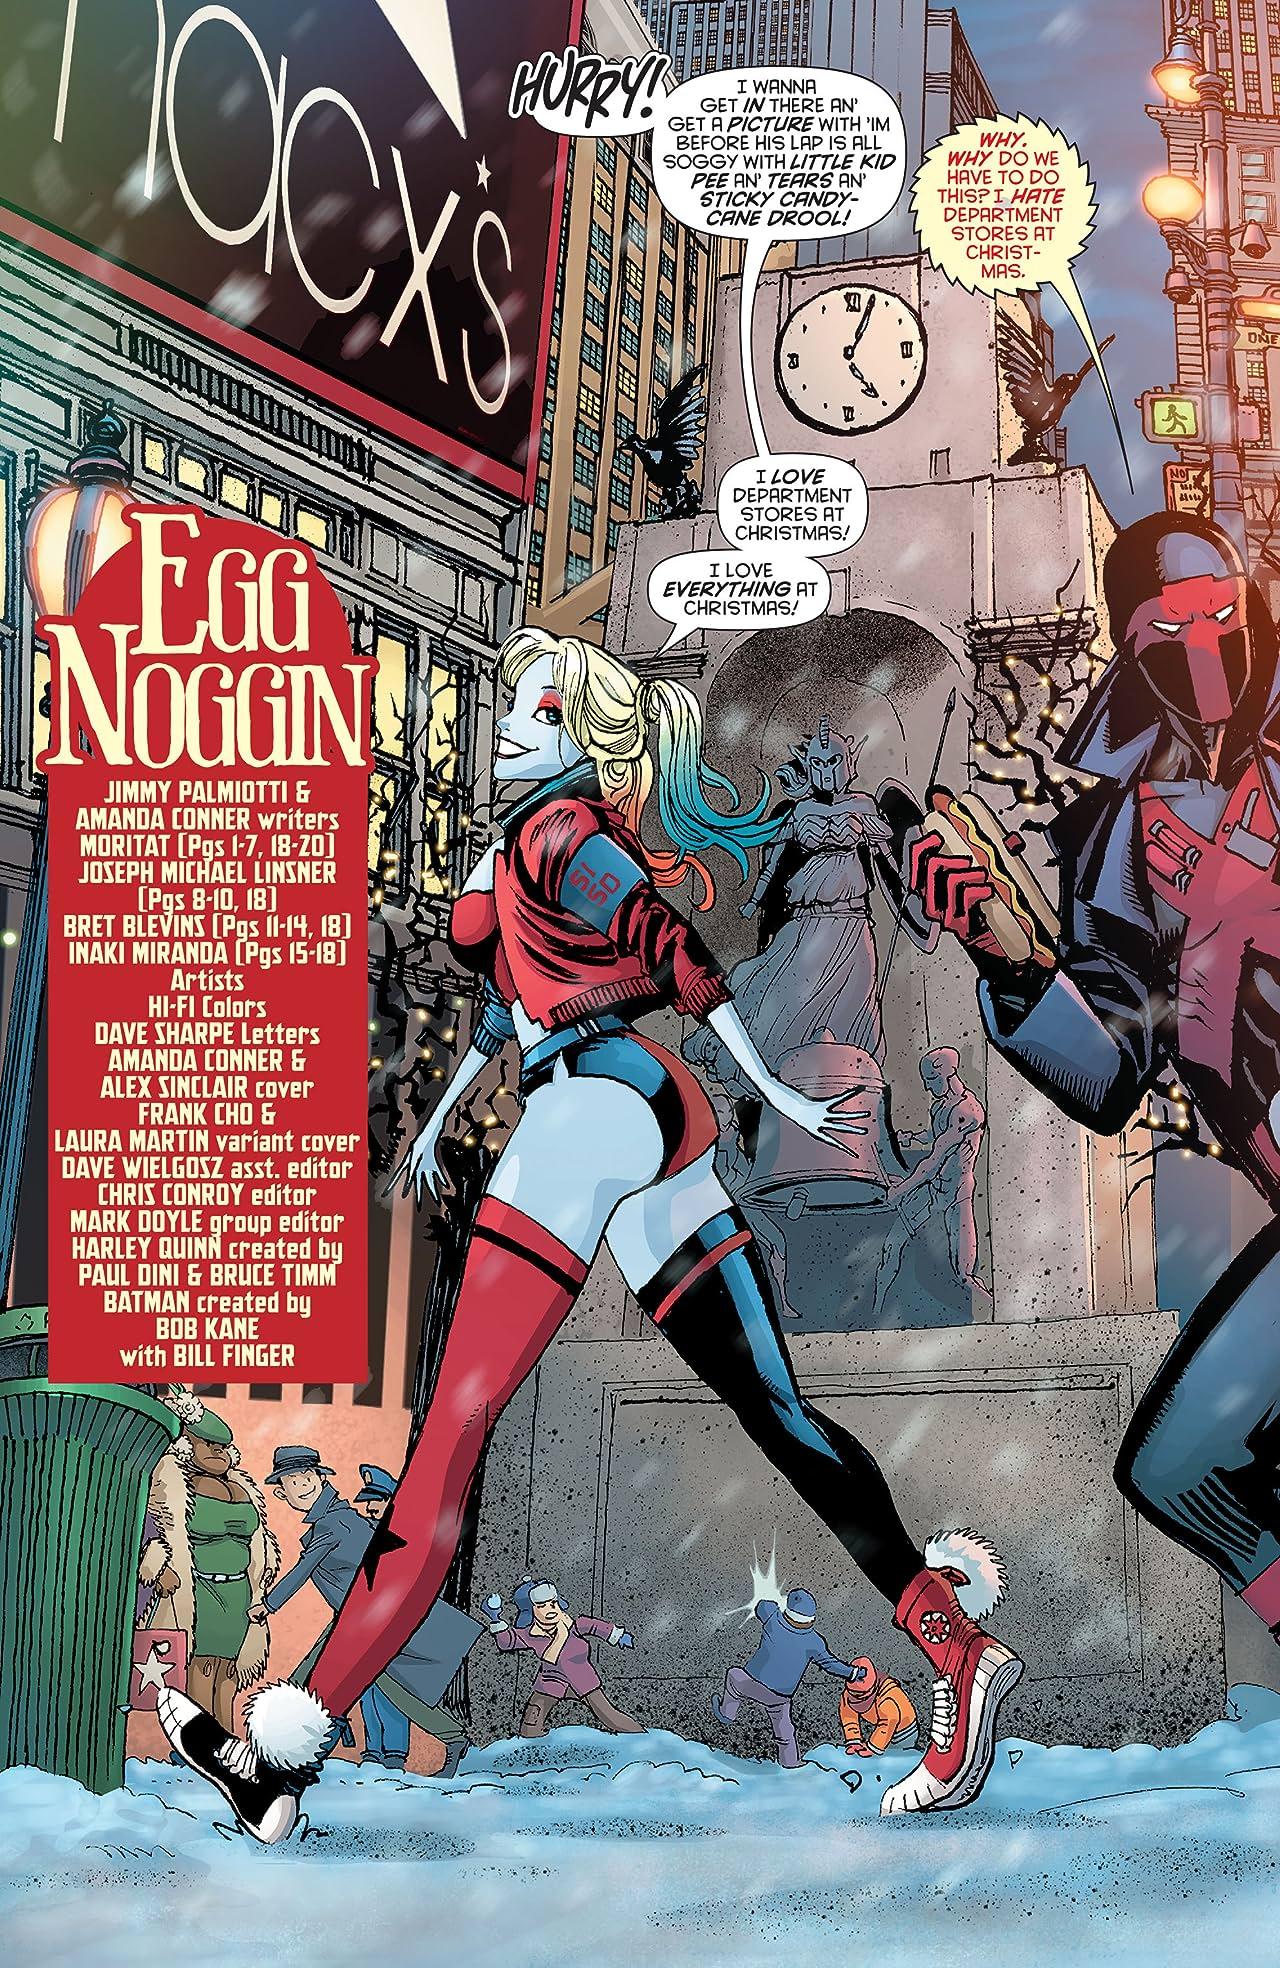 Harley Quinn (2016-) #10